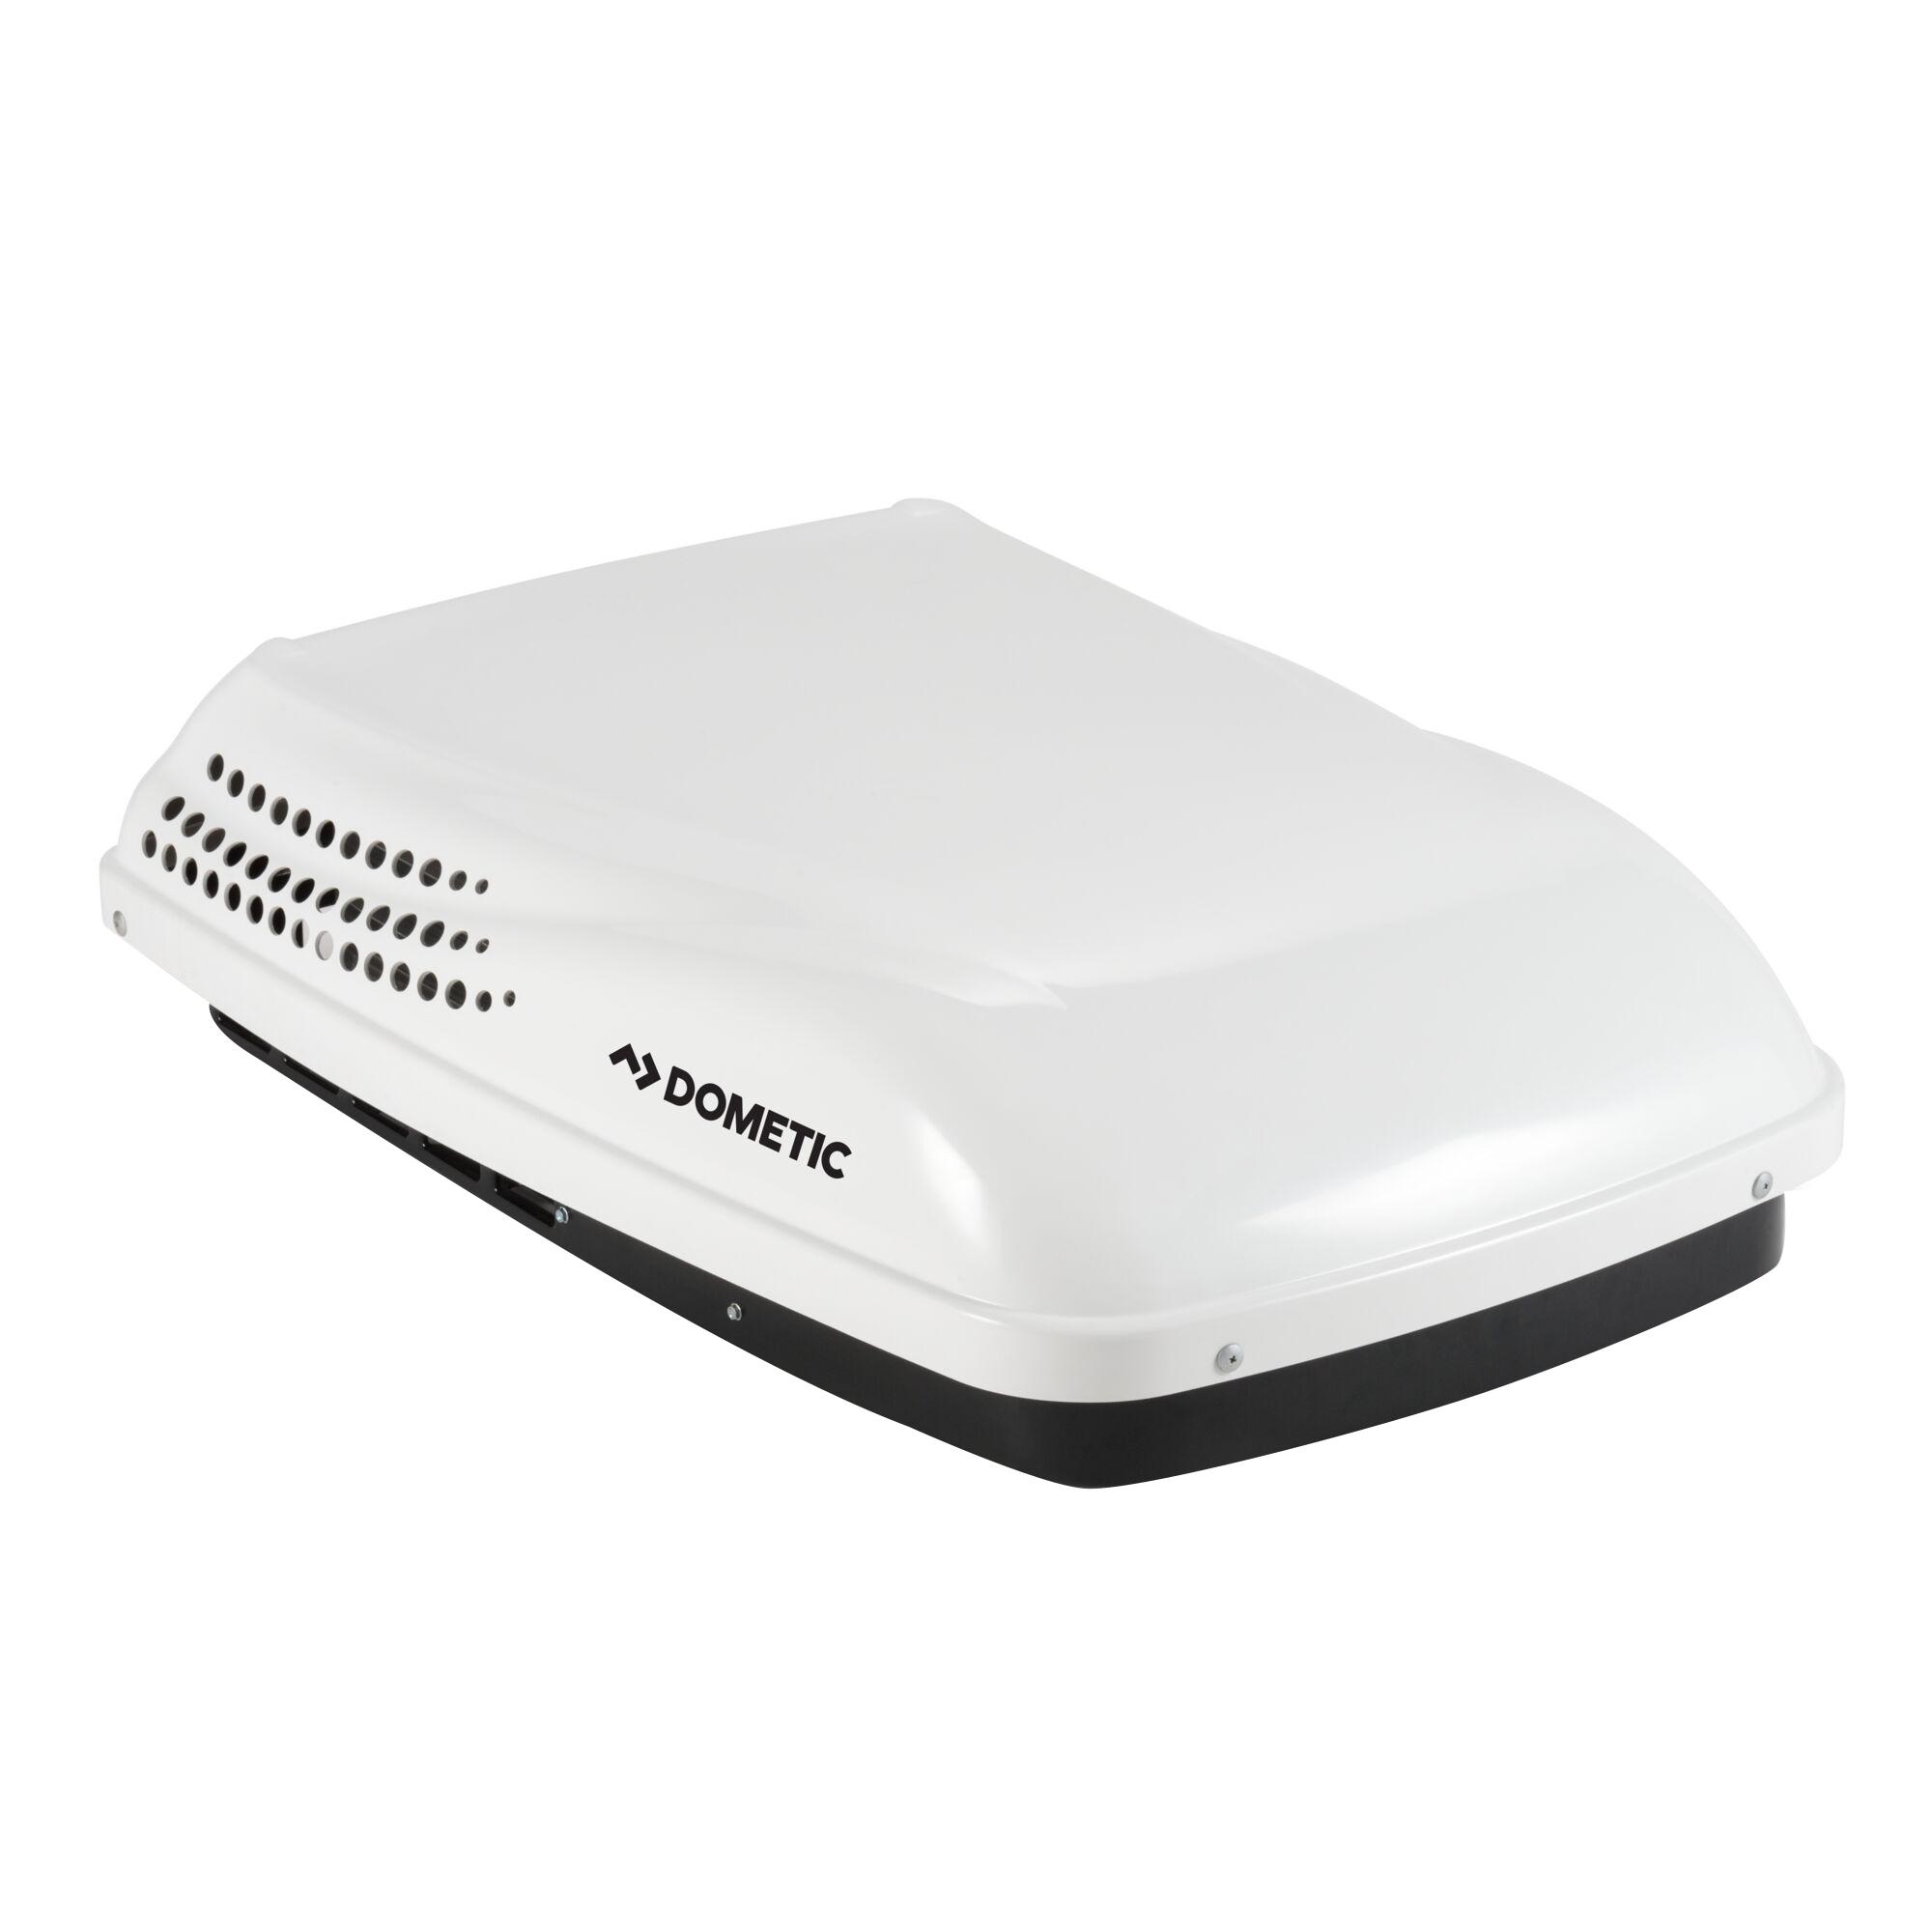 Dometic Penguin II Rooftop Air Conditioner, polar white -  651815HXX1C0-01